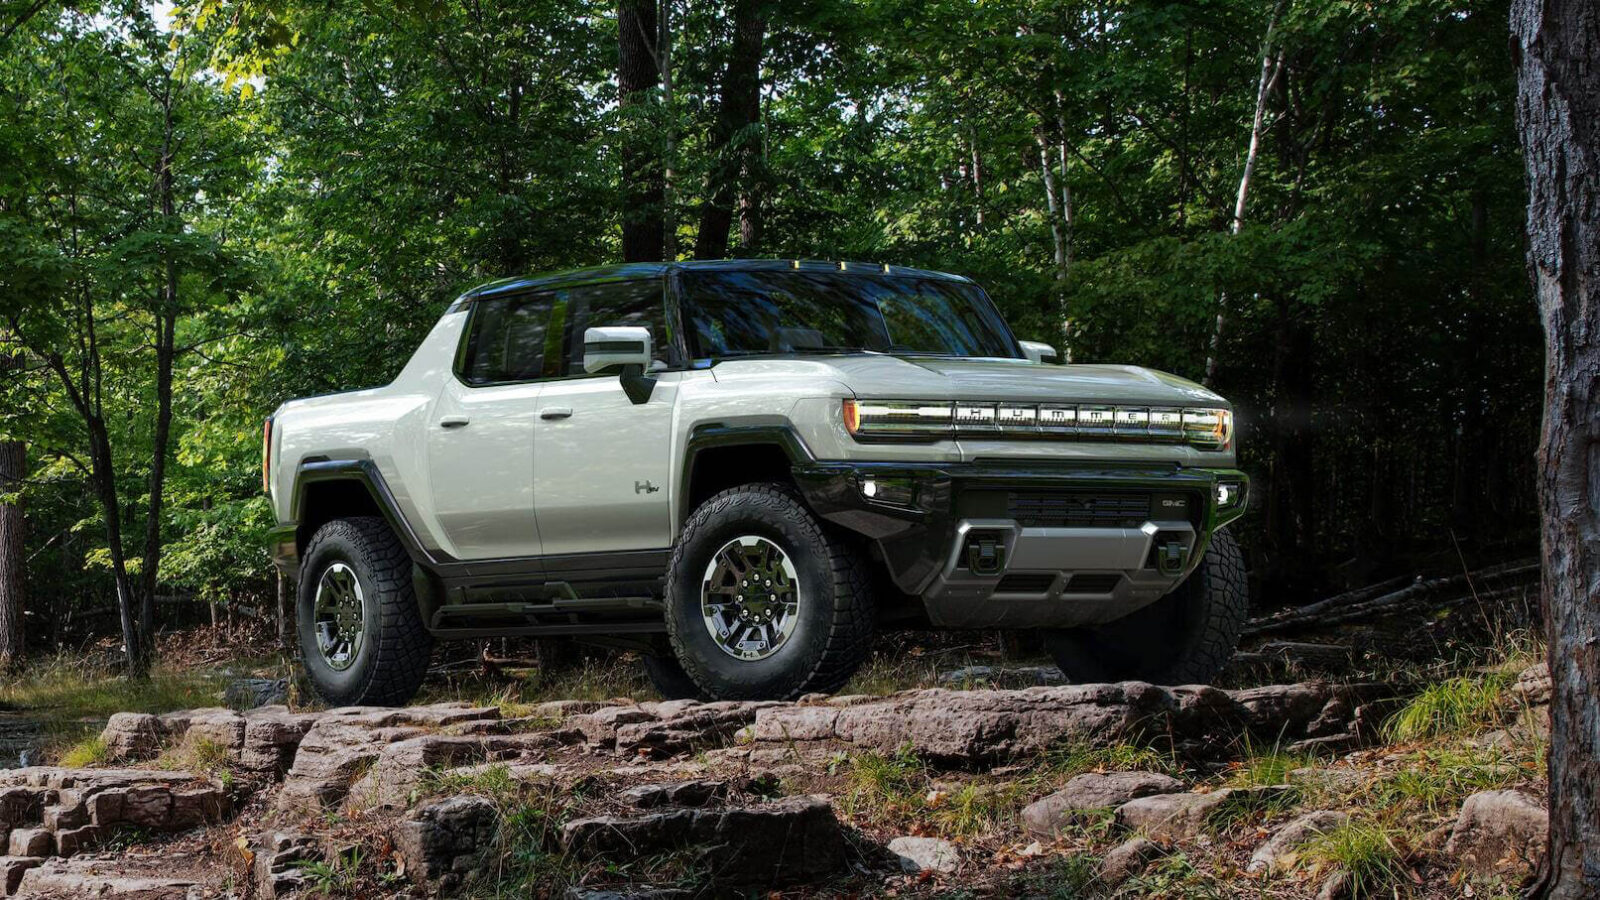 GMC Hummer EV lifted pickup truck